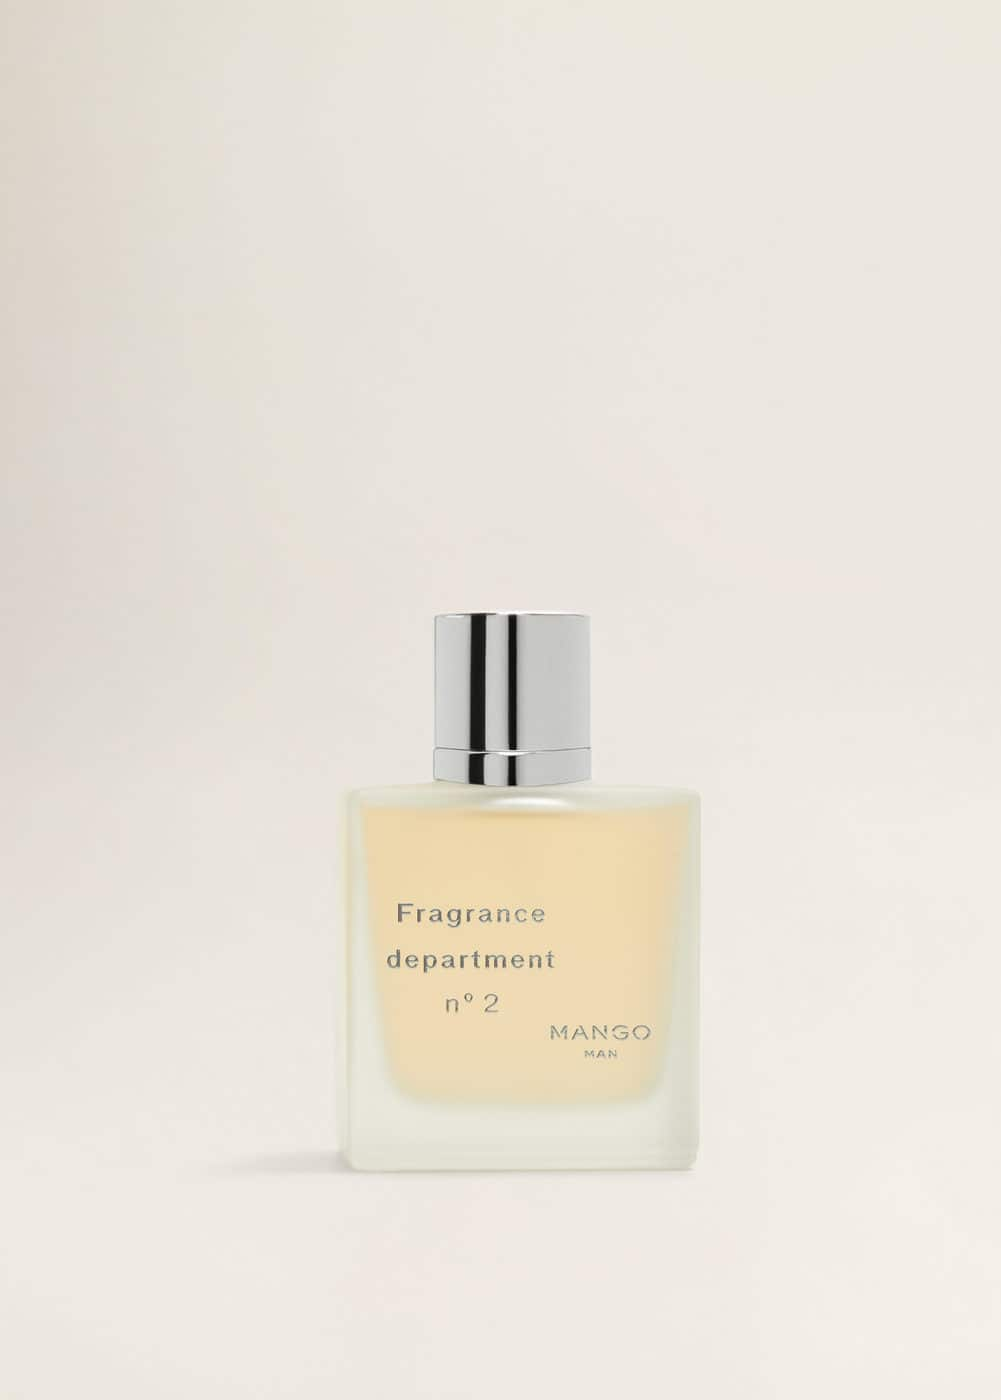 Mango - Fragrance Department Nº2 100 mL - 4